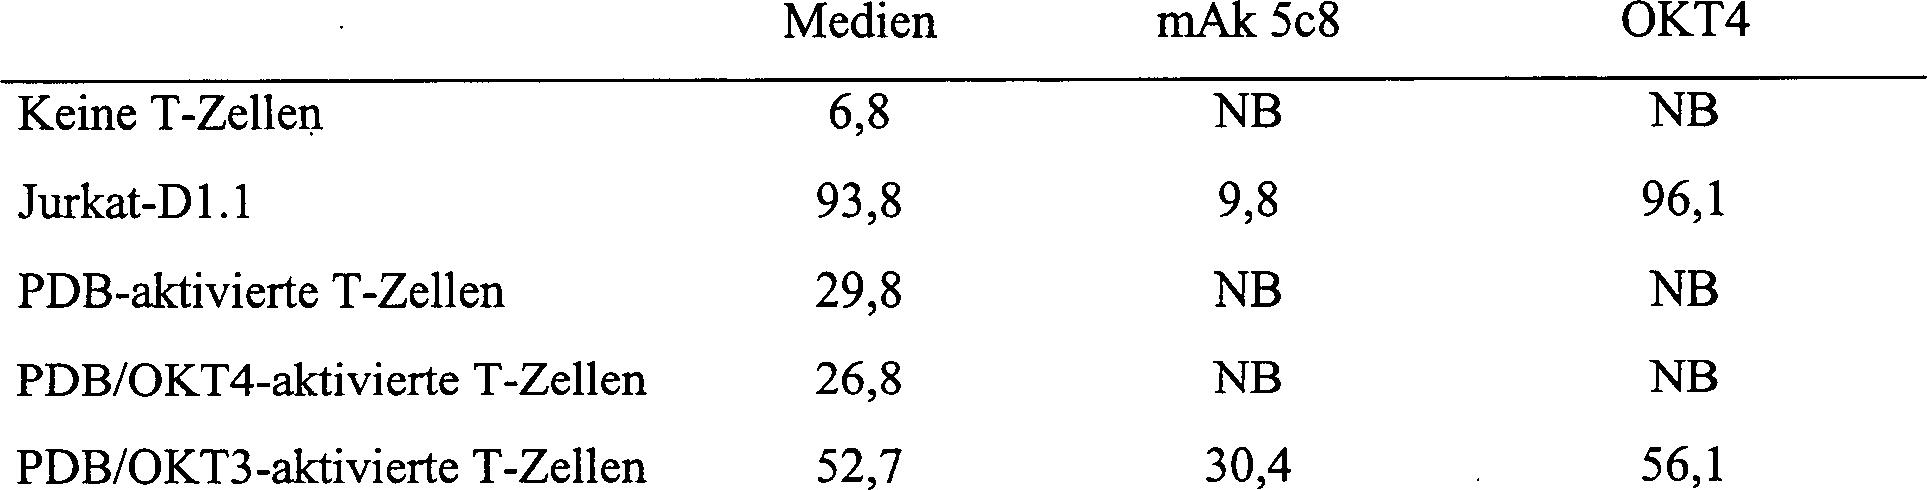 DE69233163T2 - Murine monoclonal antibody (5c8) recognizes a human ...